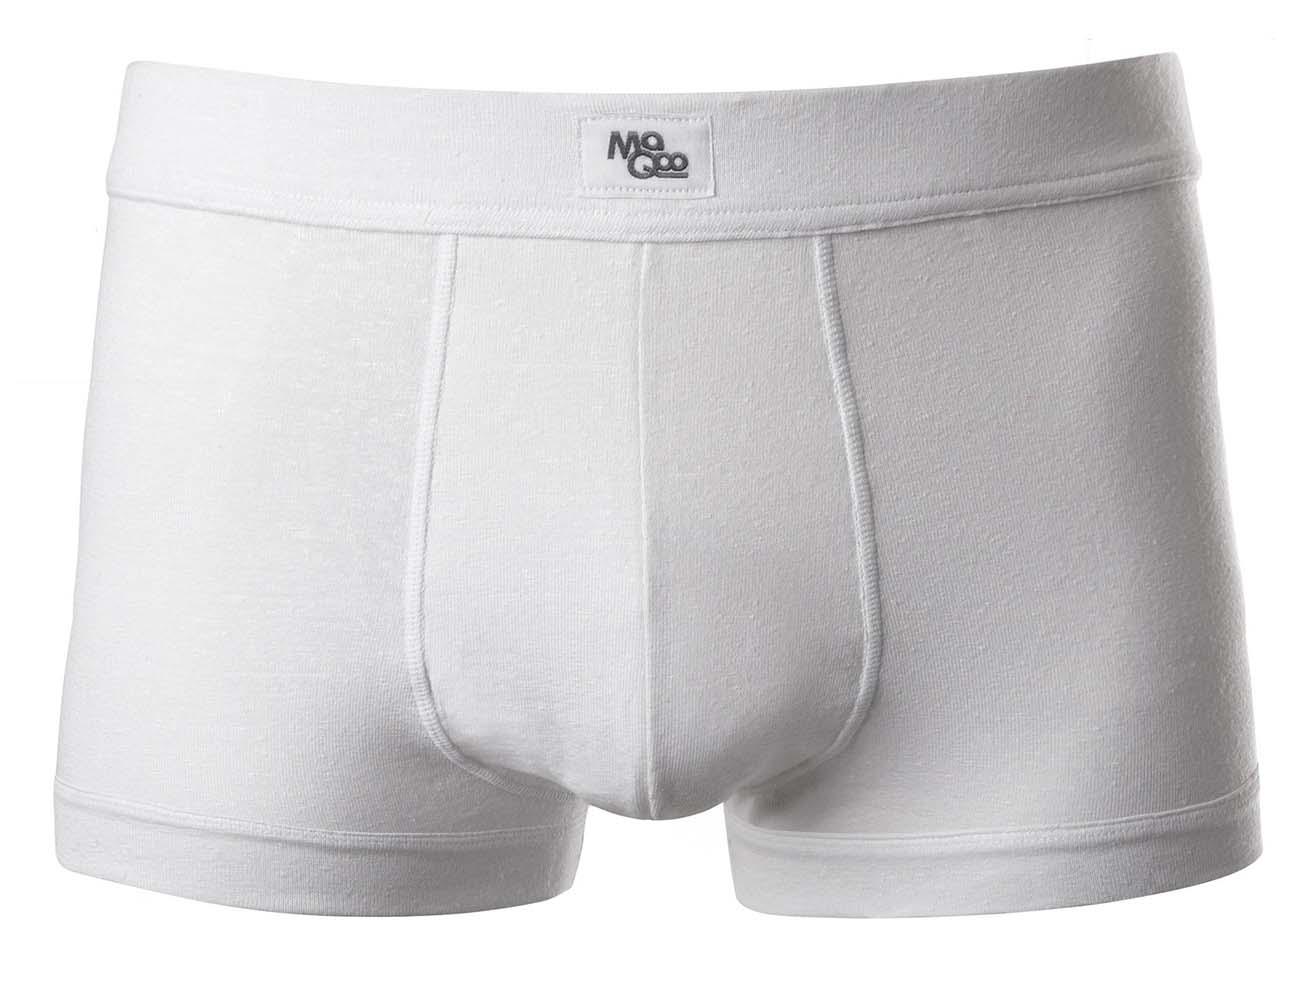 Maqoo%3A+Underwear+Revolution